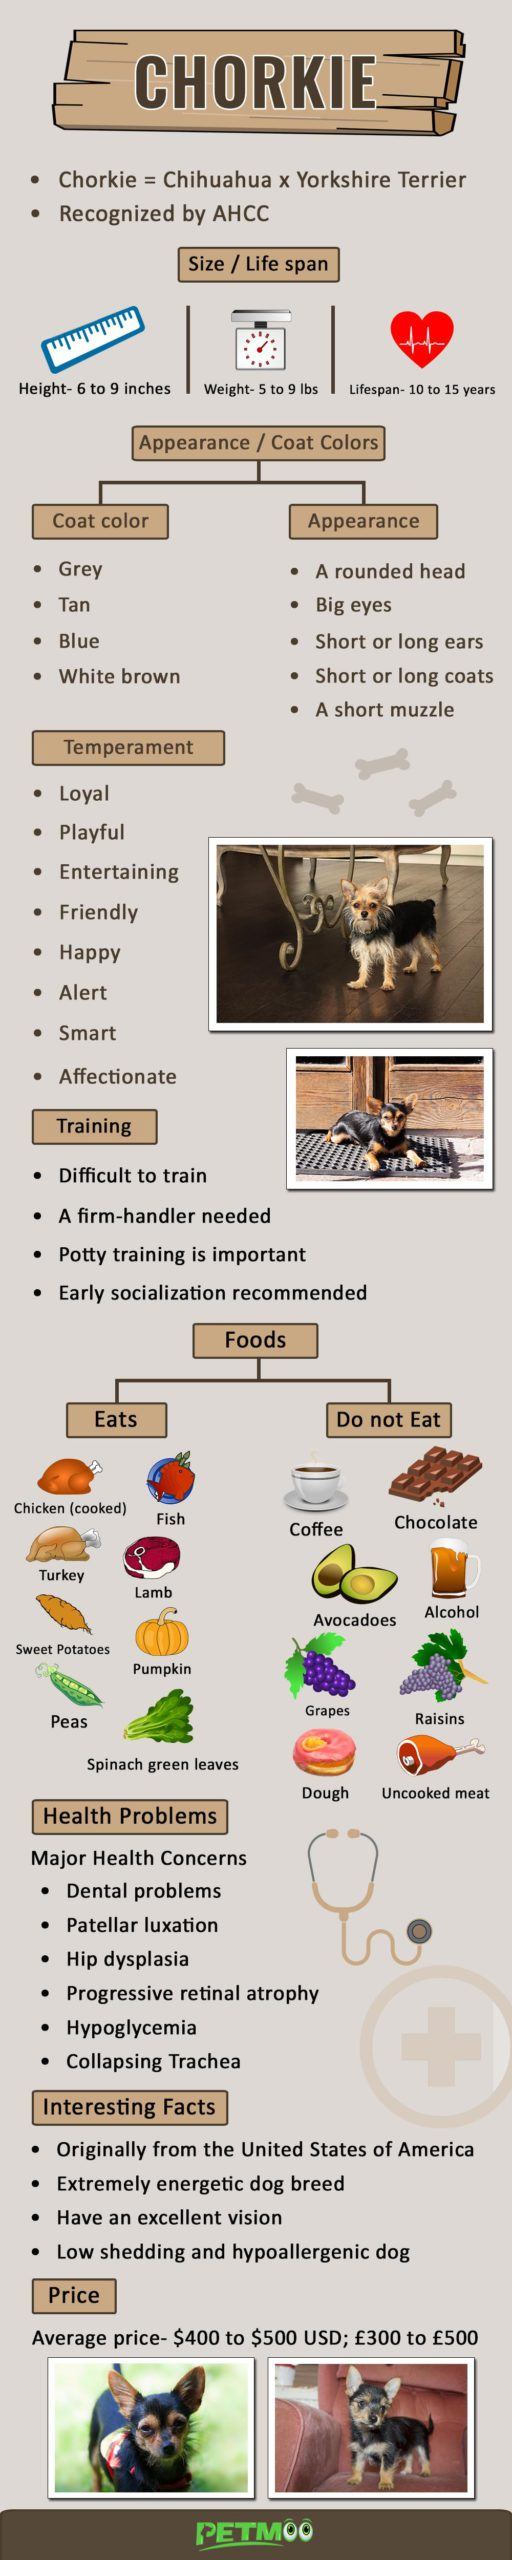 Chorkie Infographic